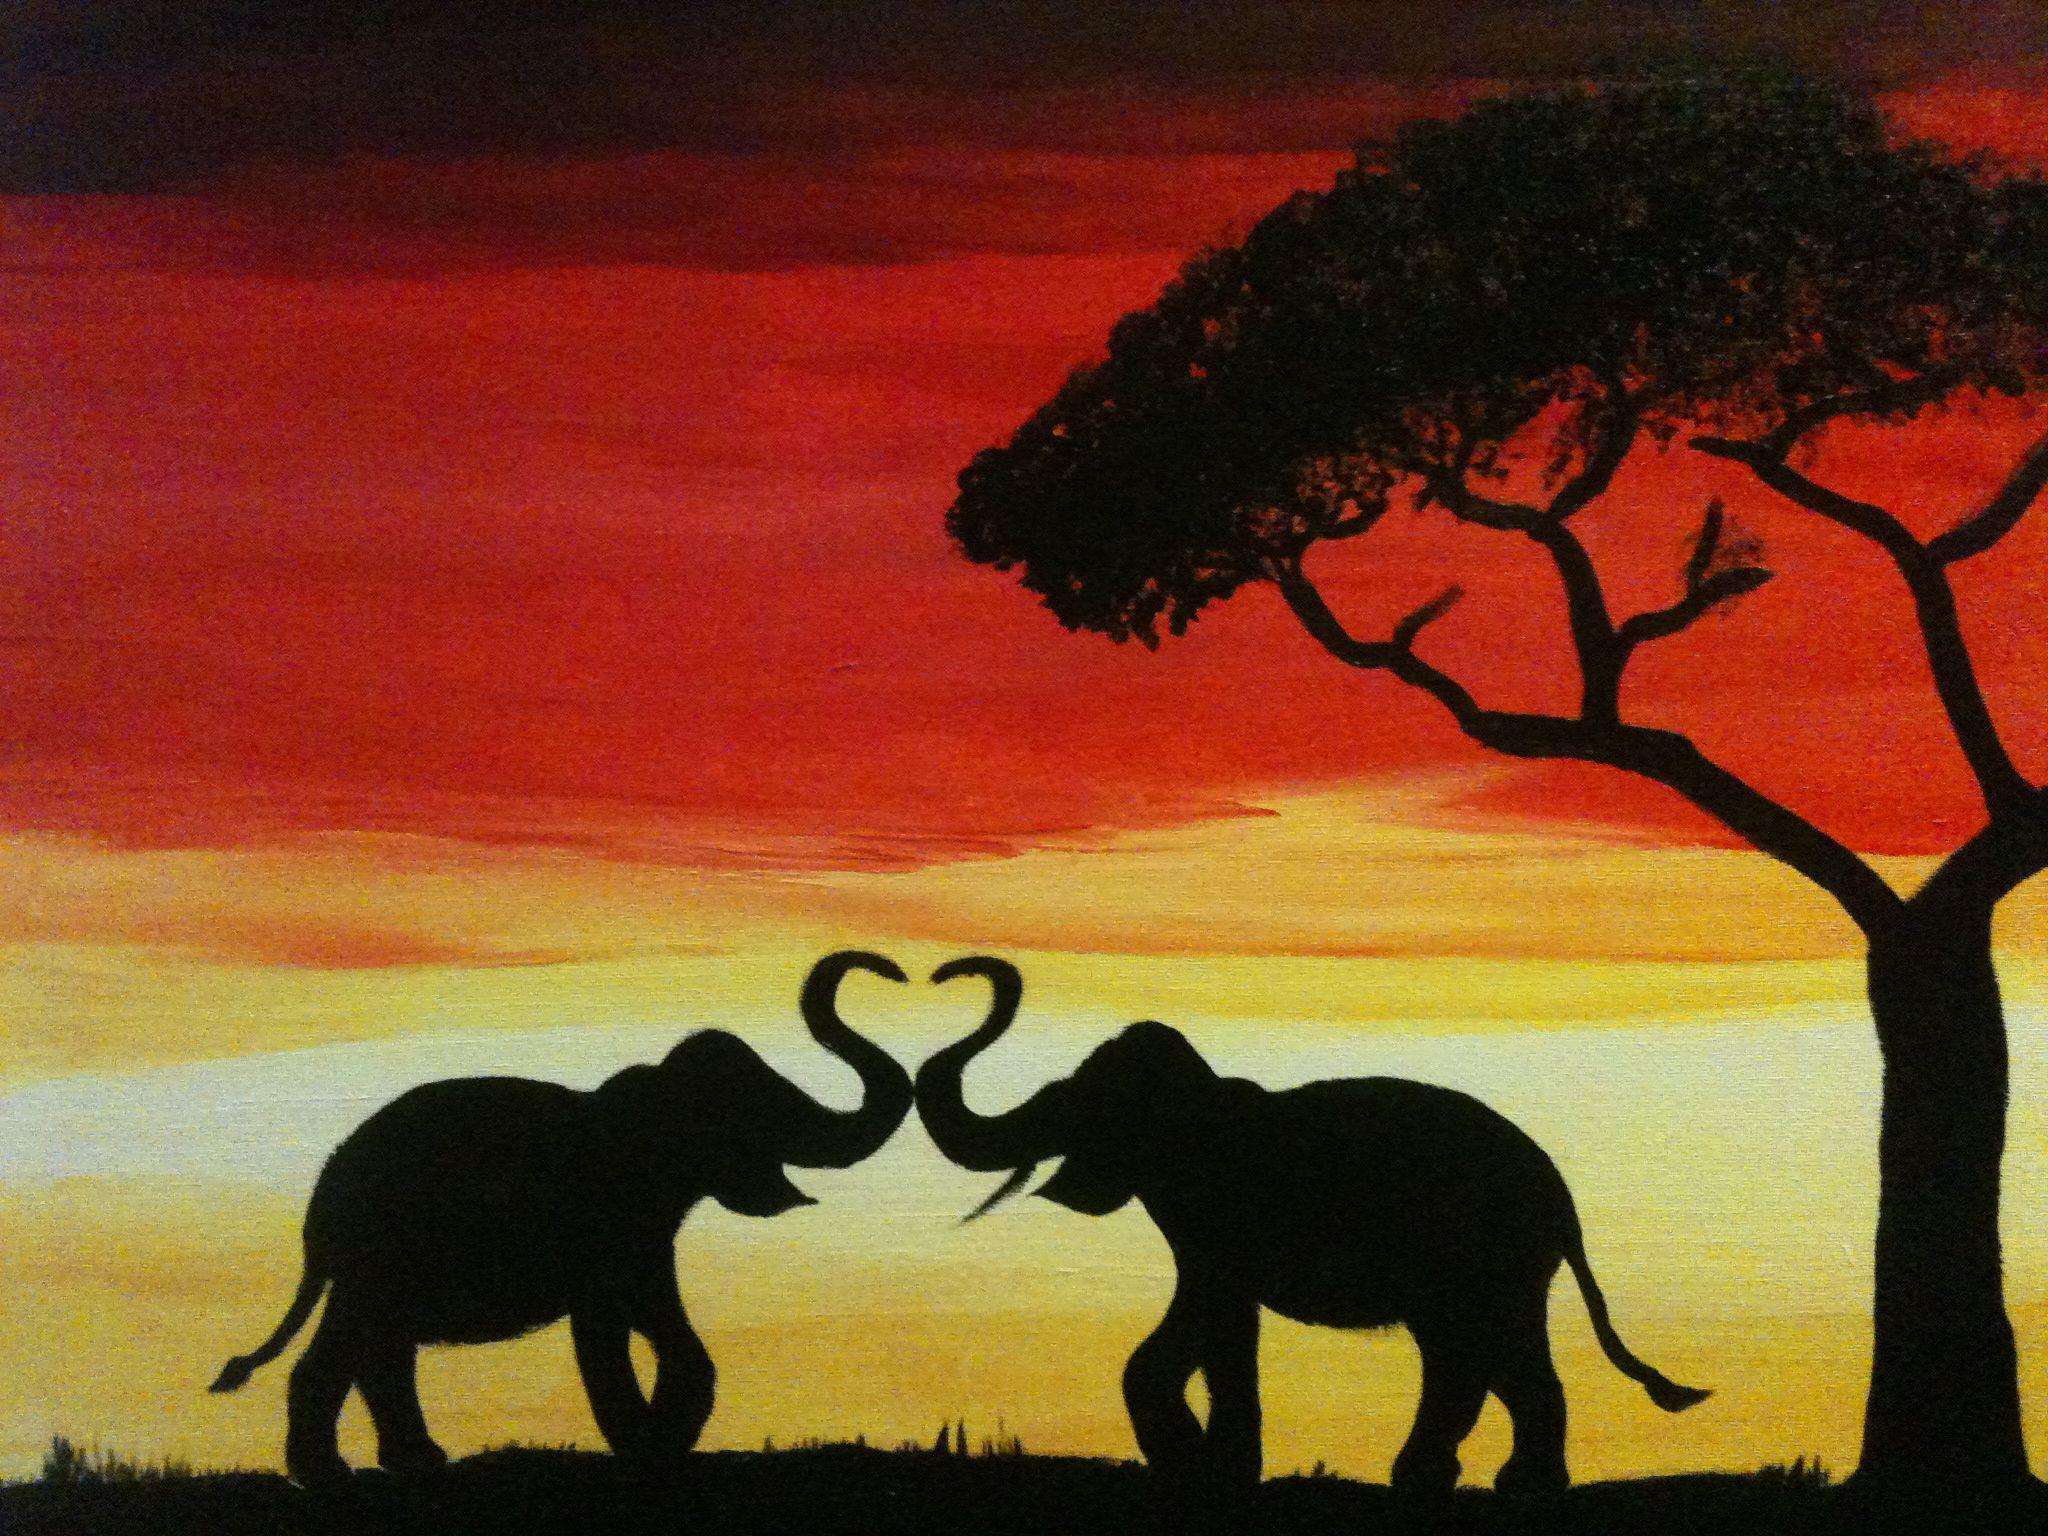 Elephant Love painting | My Artwork | Pinterest | Artwork ... - photo#7